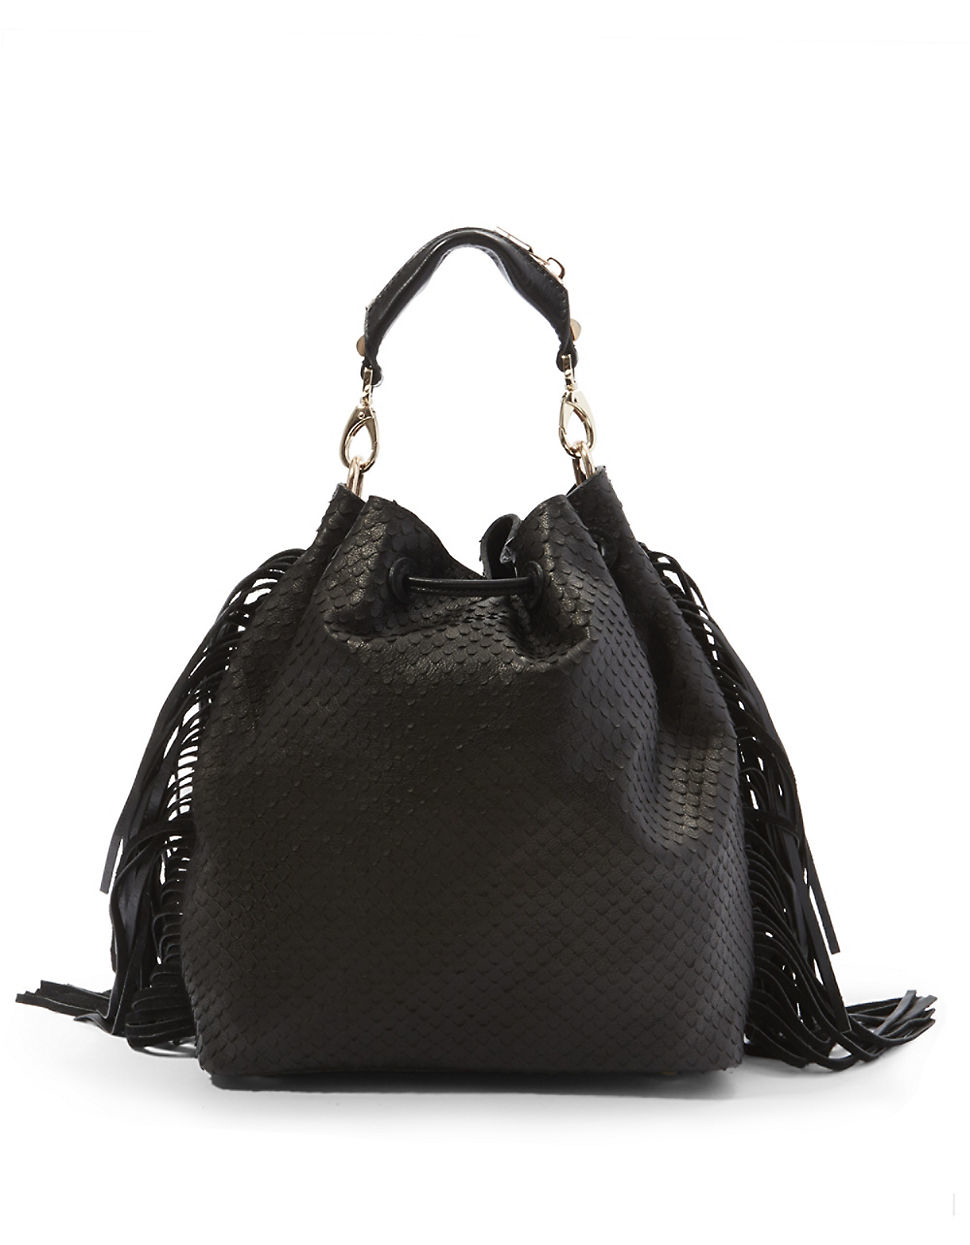 B Brian Atwood Handbags Handbag